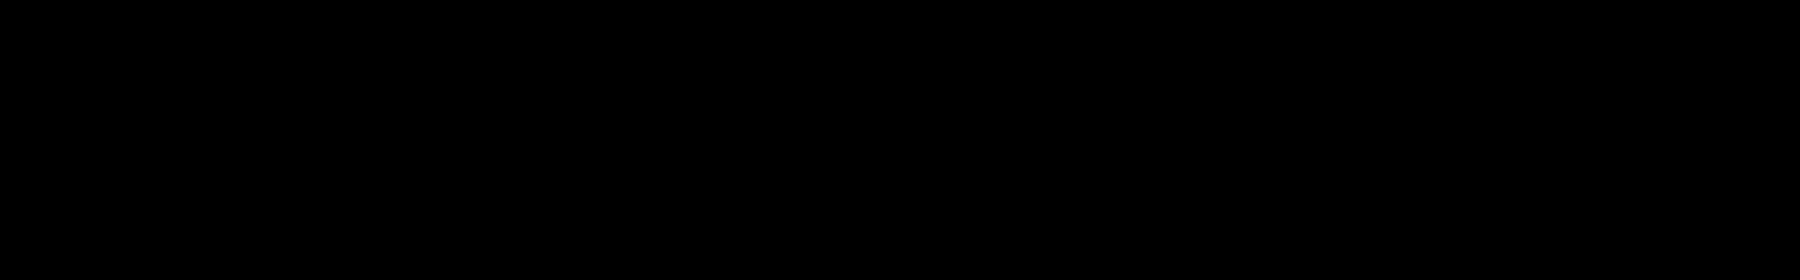 Voicians – Rapid Pulse DnB audio waveform